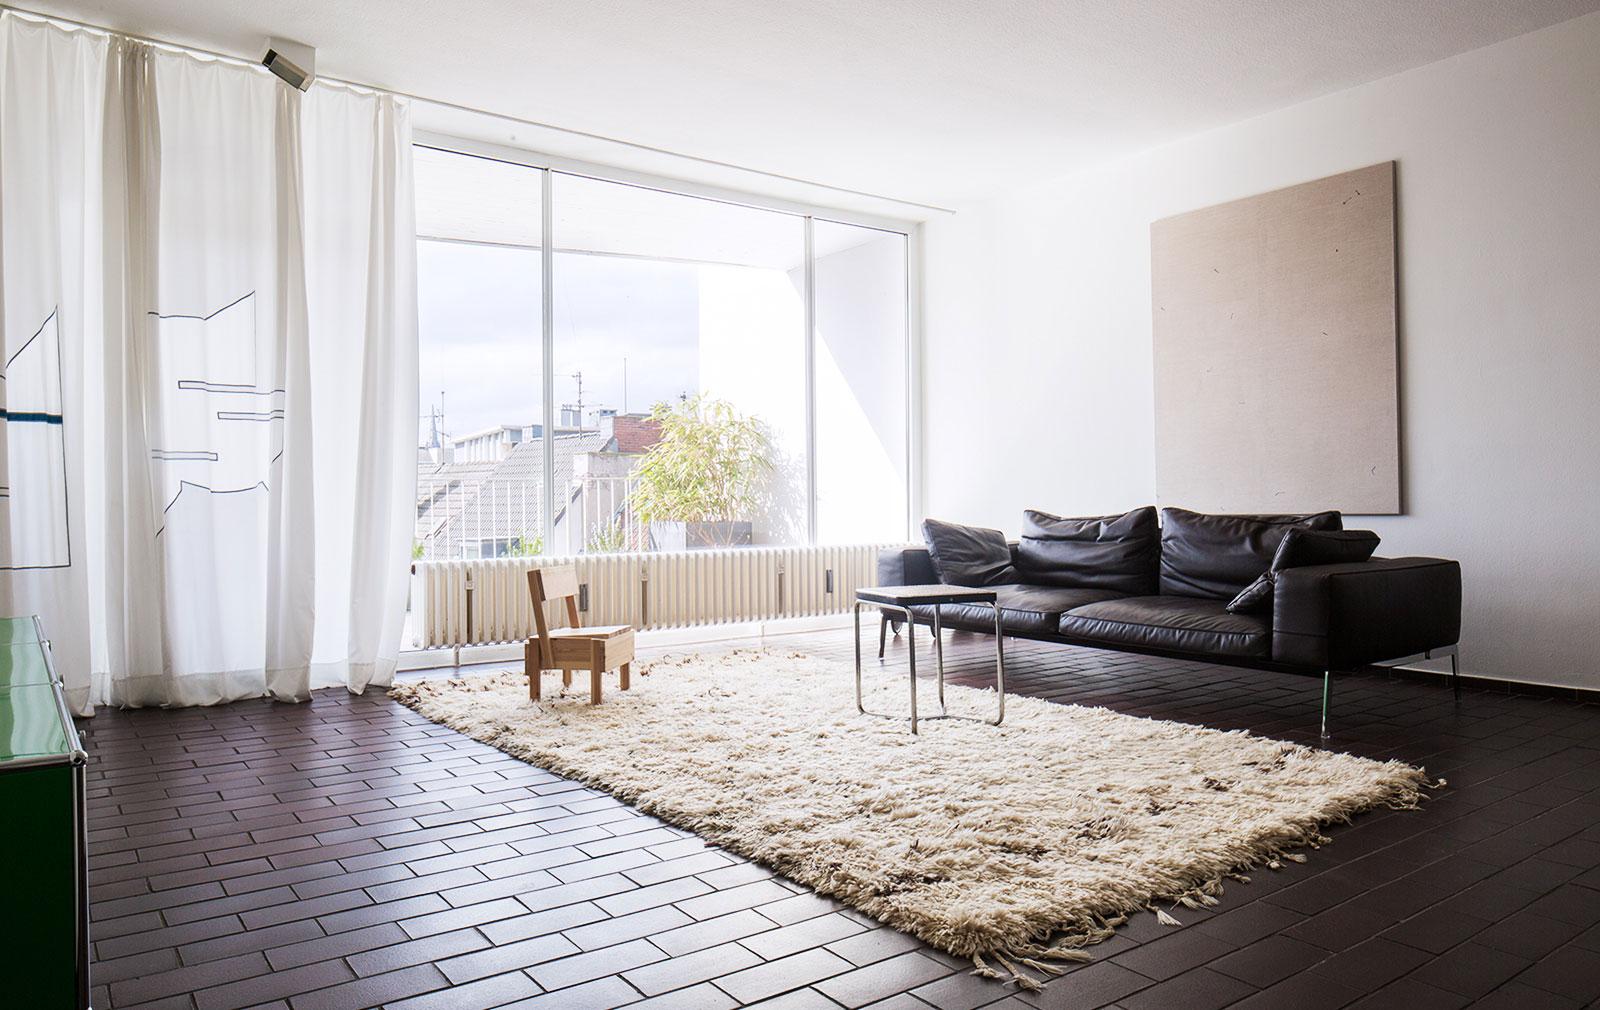 Daniel-Hug-Apartment-01